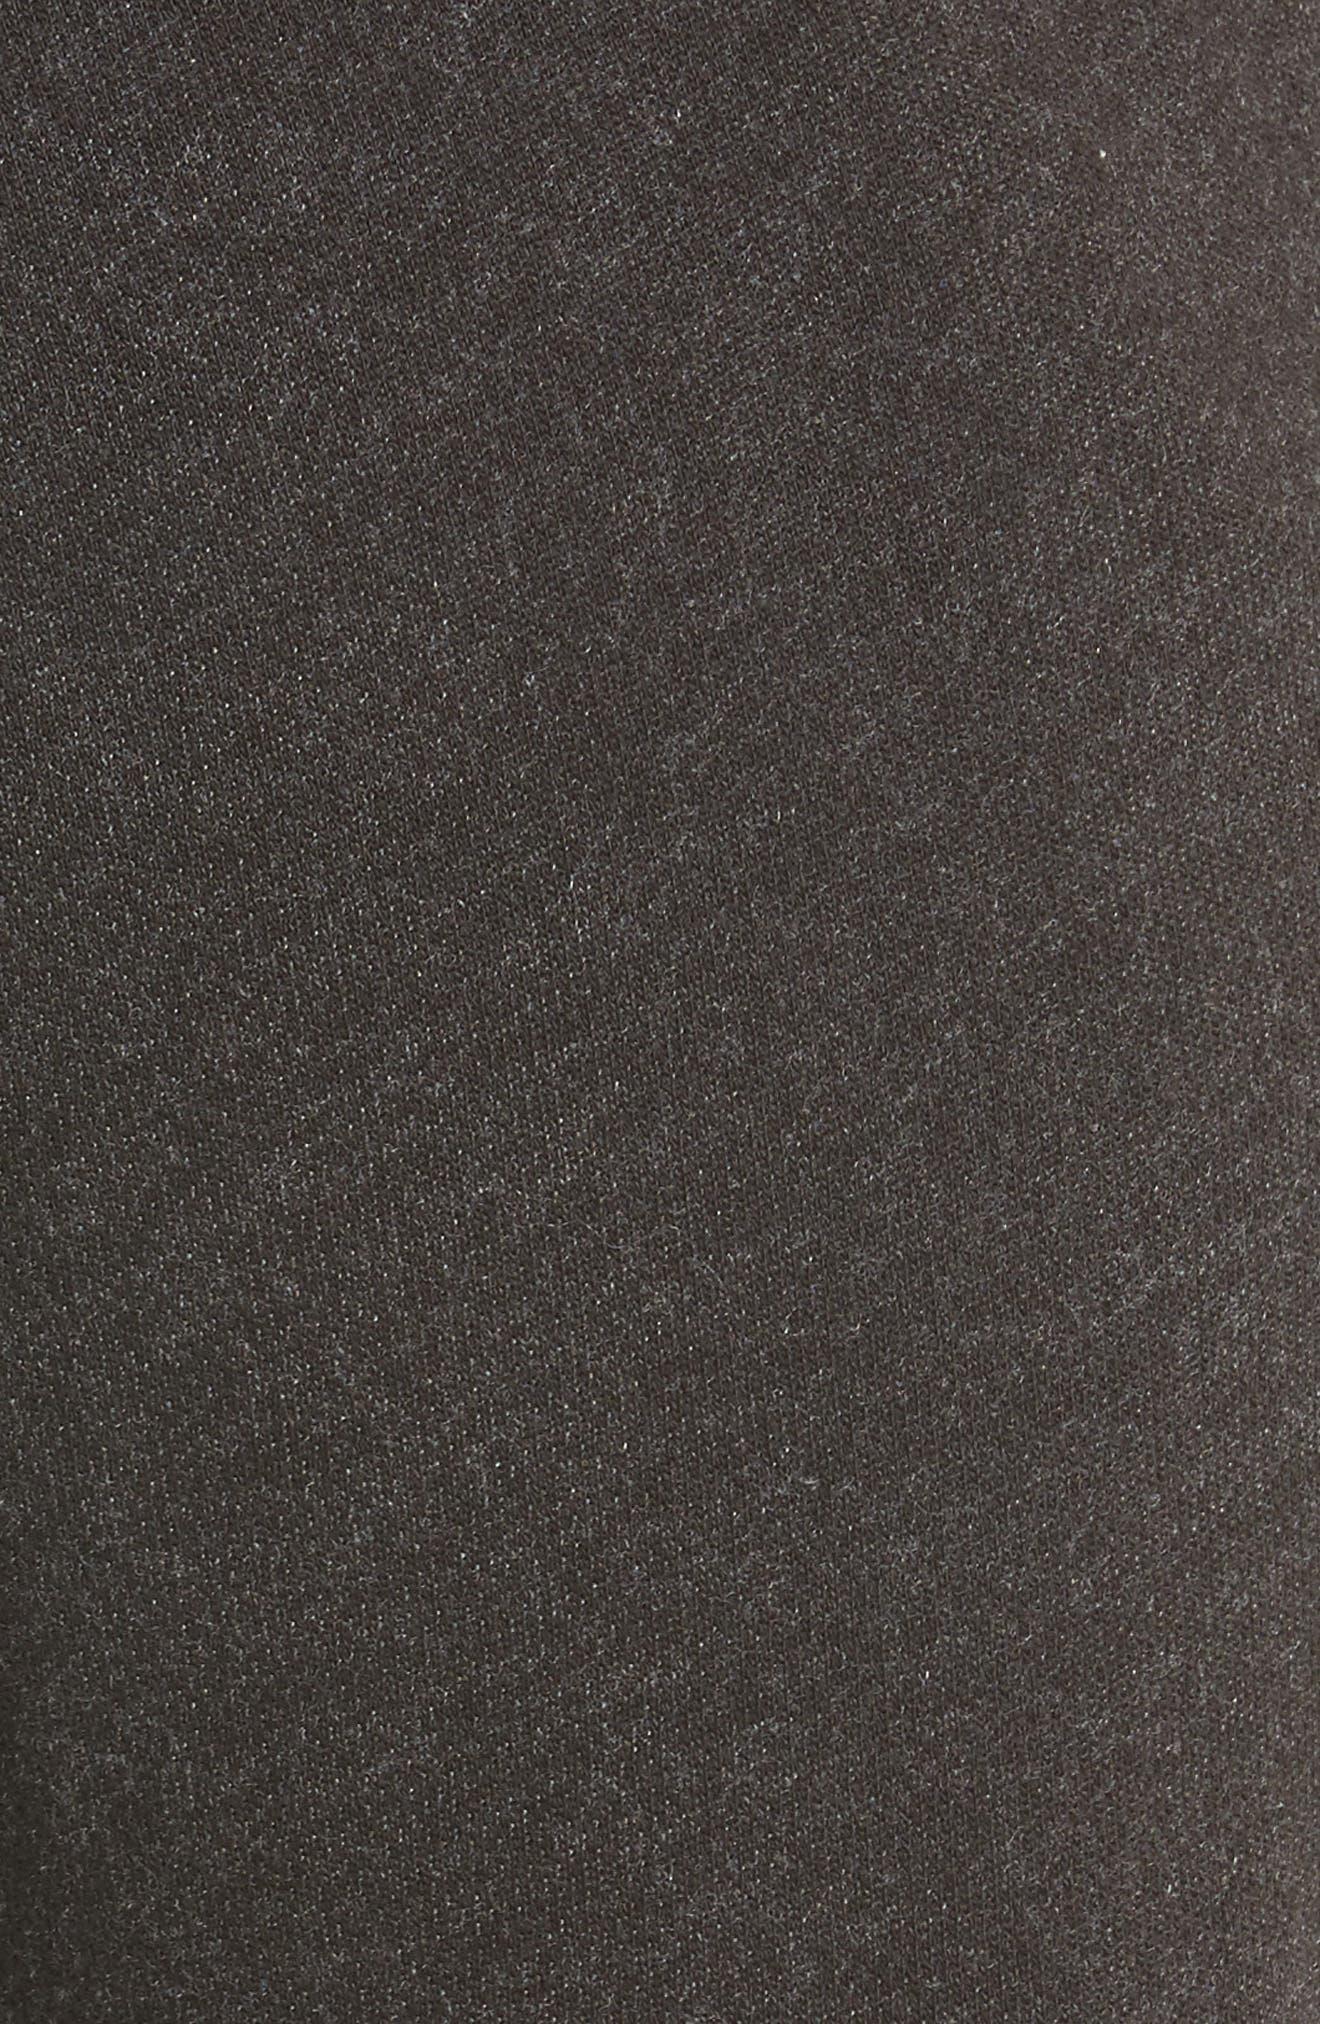 Jogger Pants,                             Alternate thumbnail 5, color,                             Charcoal